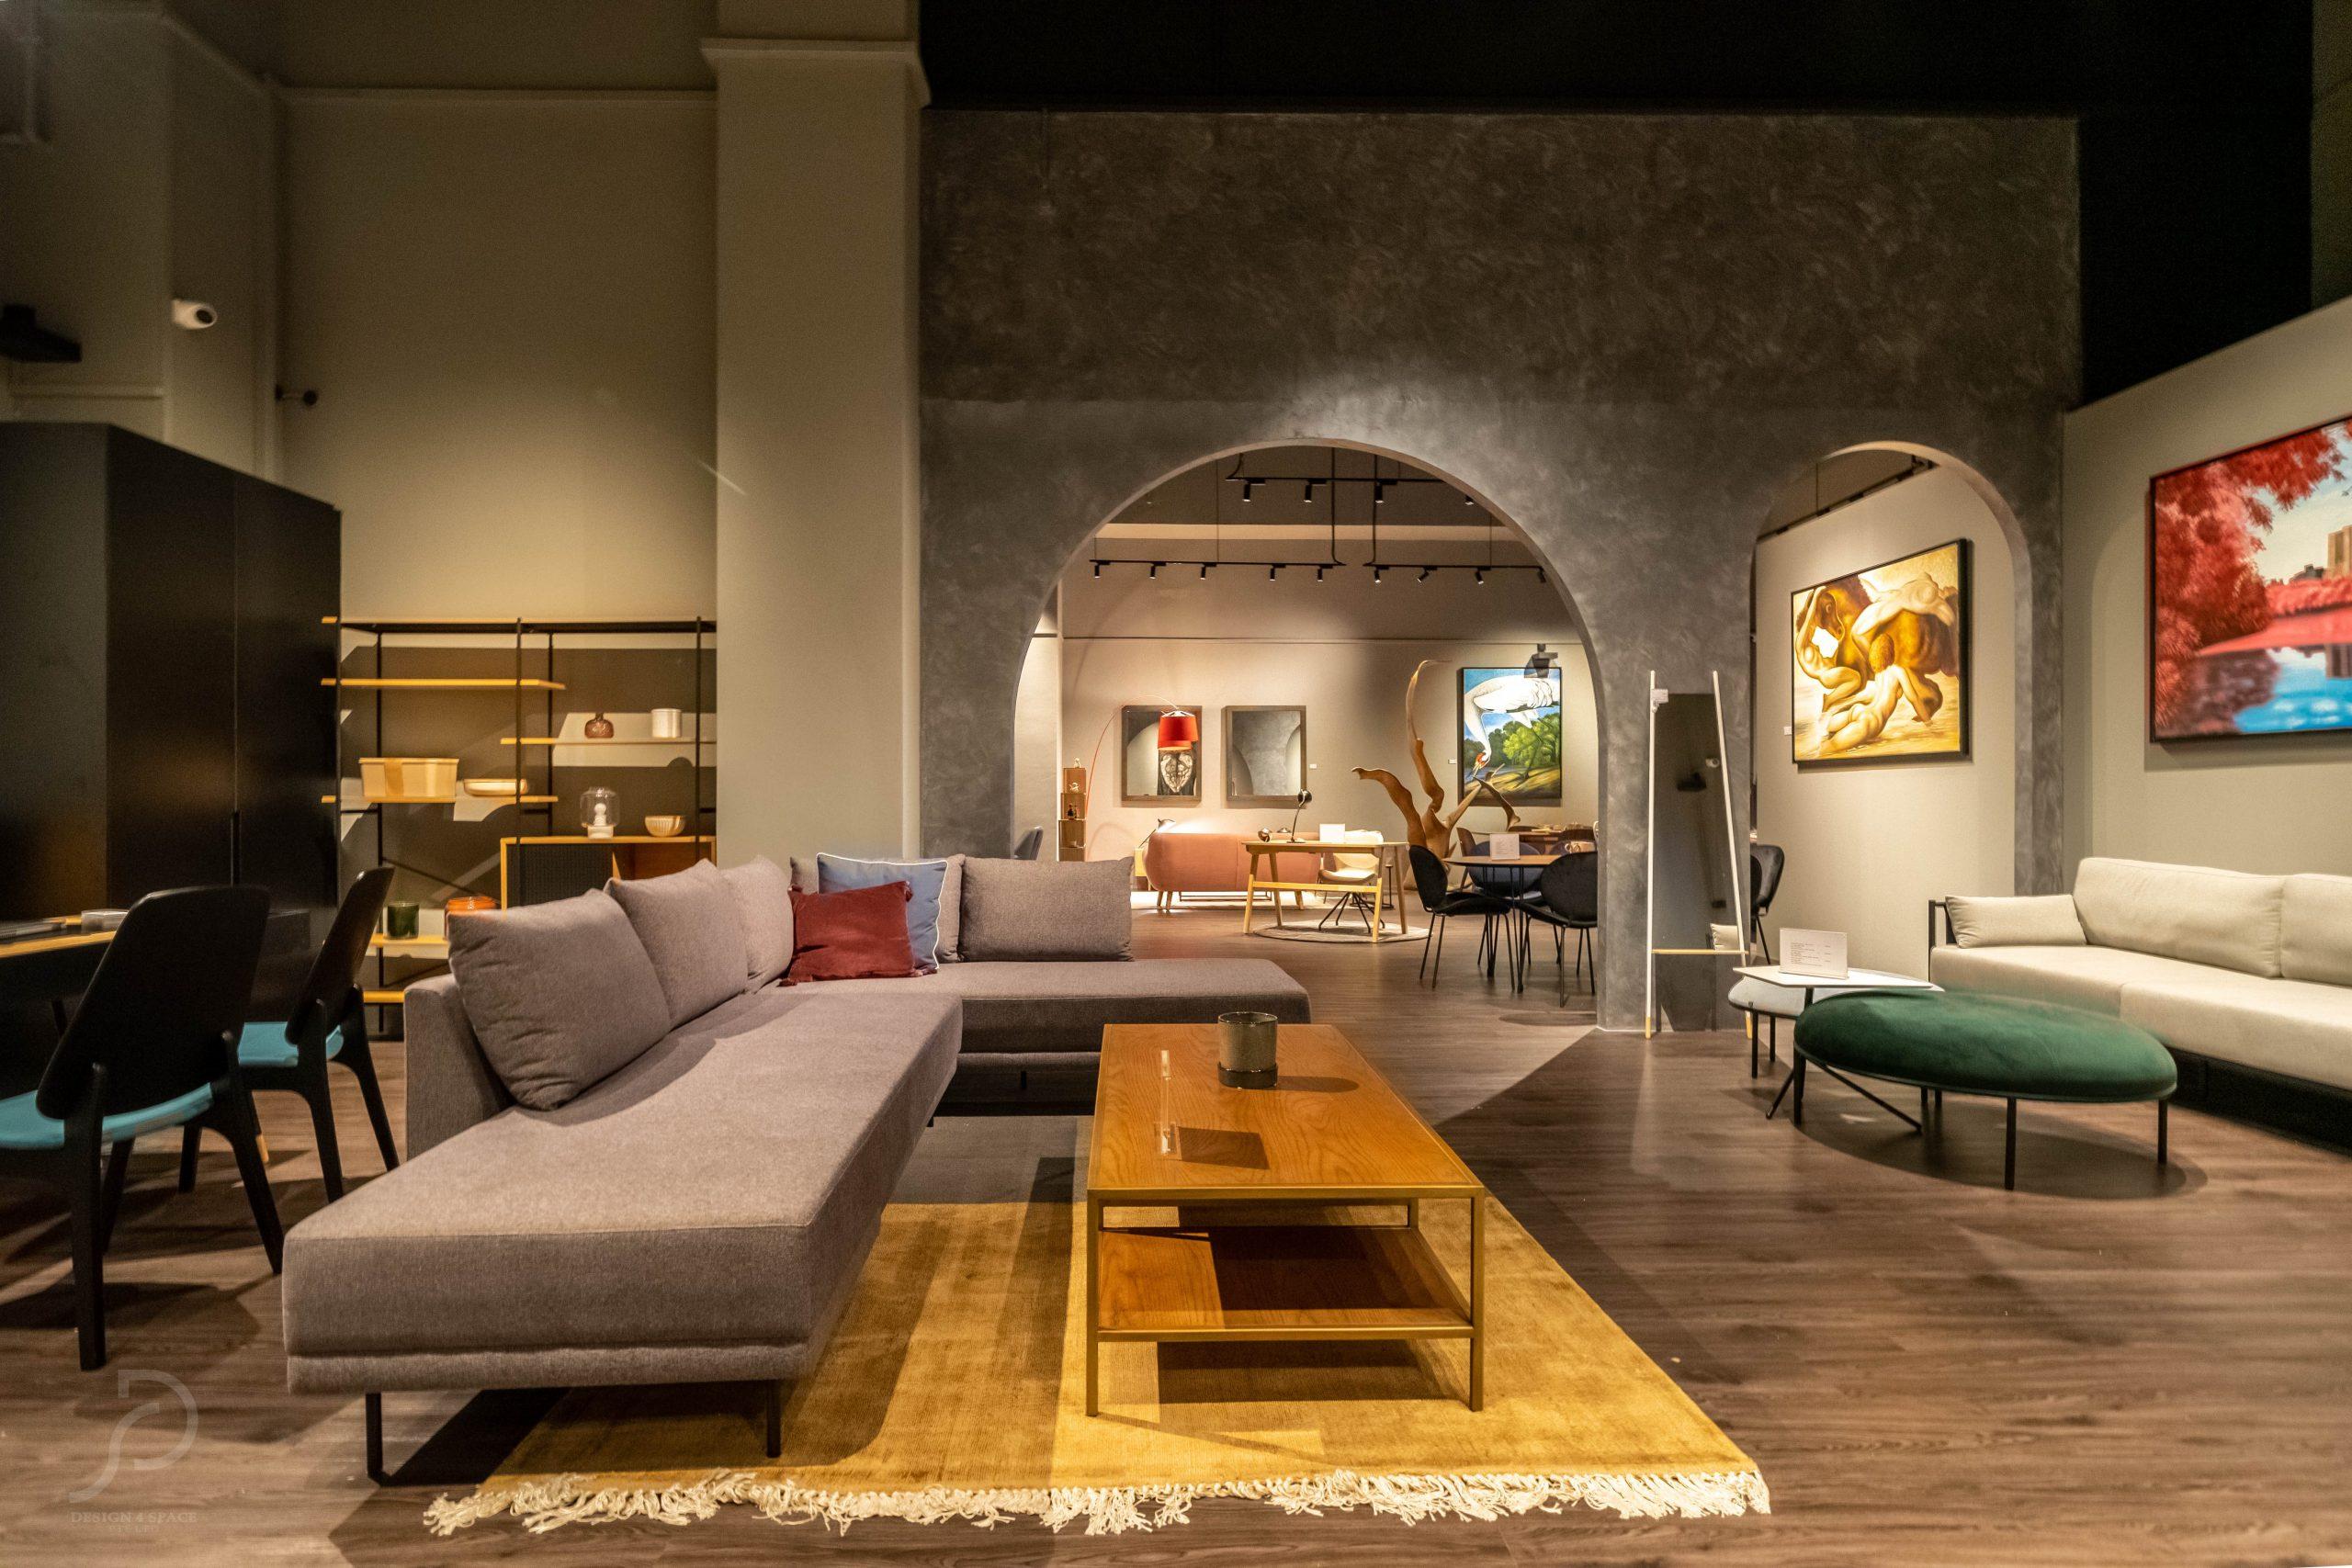 Furniture boutique16